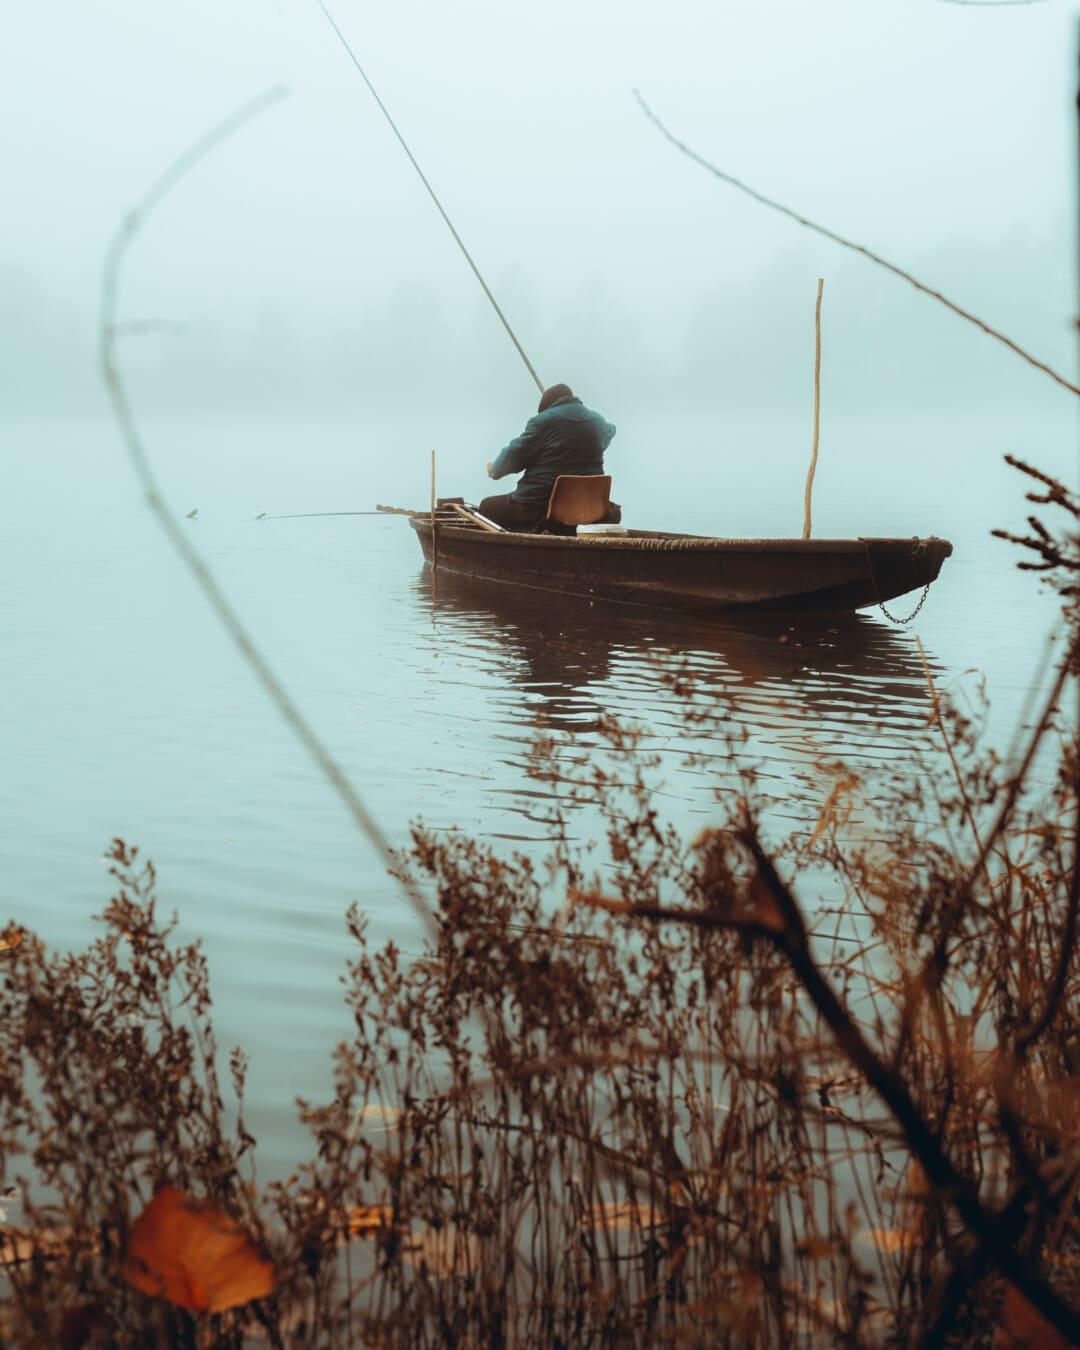 Boot, Fischer, Wasser, Wasserfahrzeuge, See, Dämmerung, Fahrzeug, Fluss, Natur, Angelboot/Fischerboot